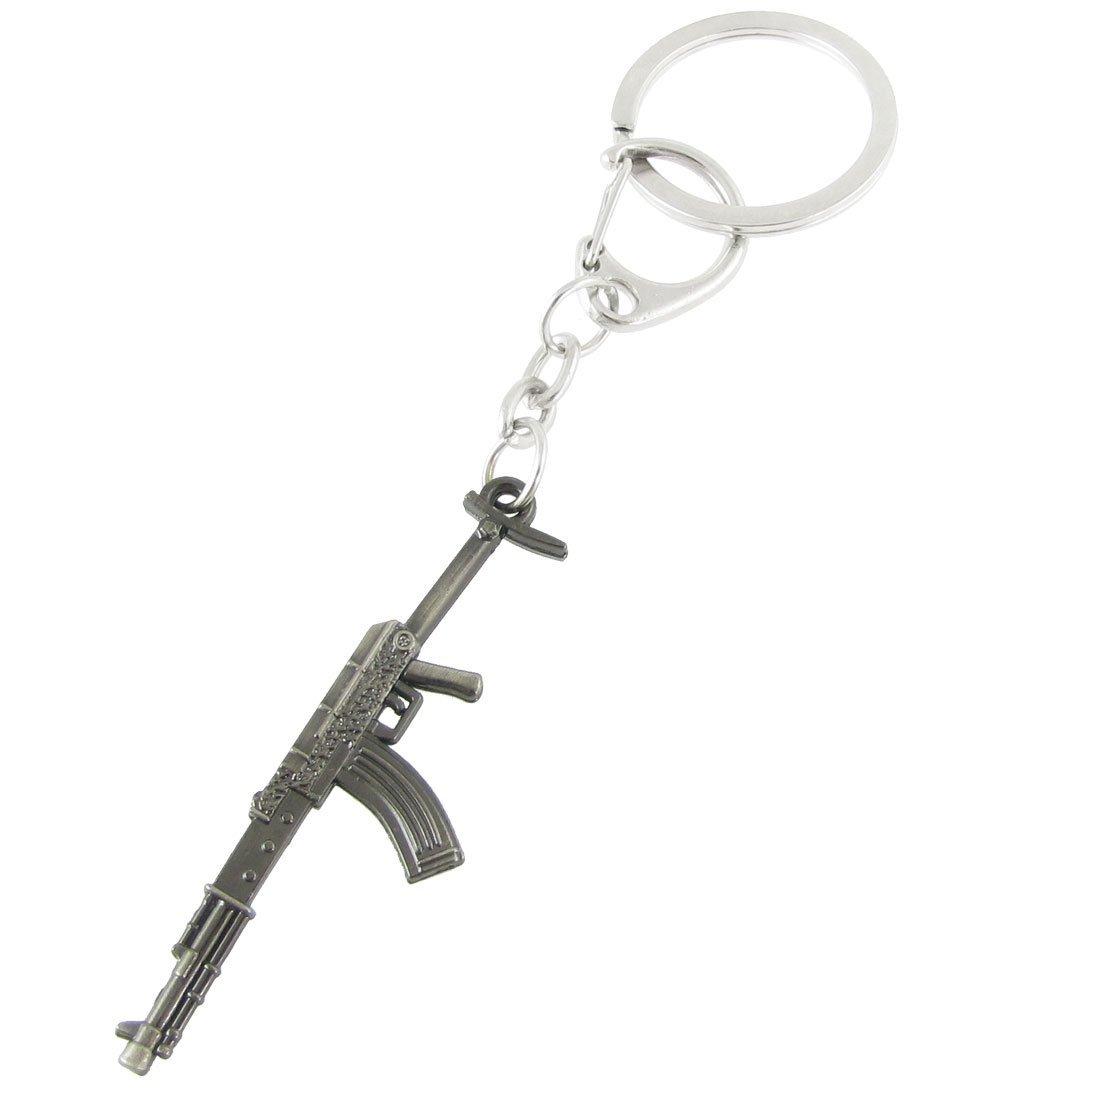 K2 Asalto Rifle colgante de la langosta Llavero del pedernal ...